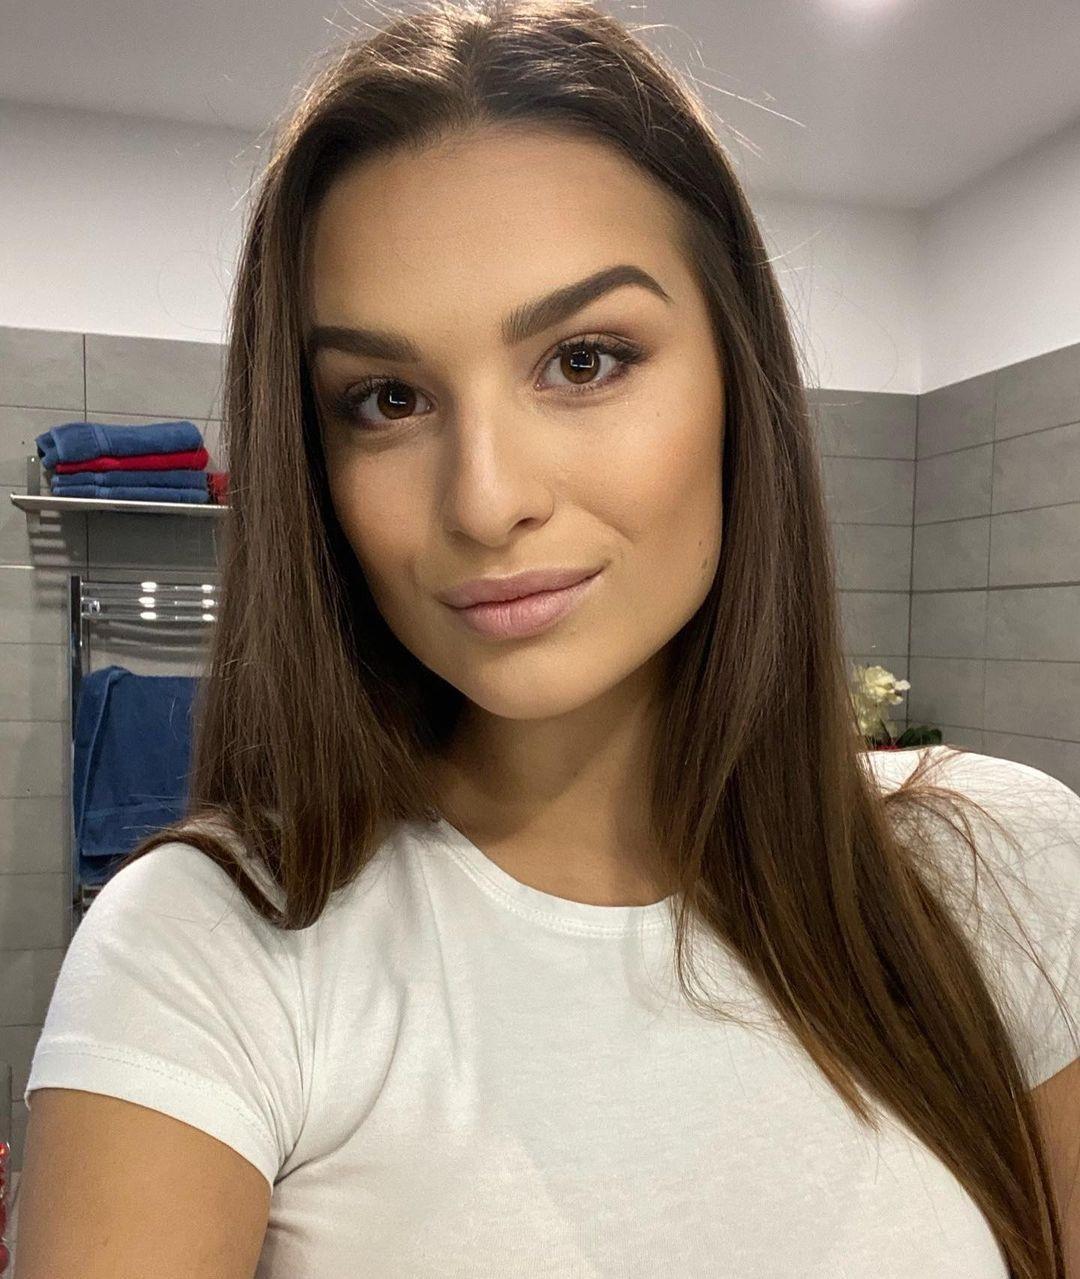 Dominika-Vinsova-Wallpapers-Insta-Fit-Bio-8